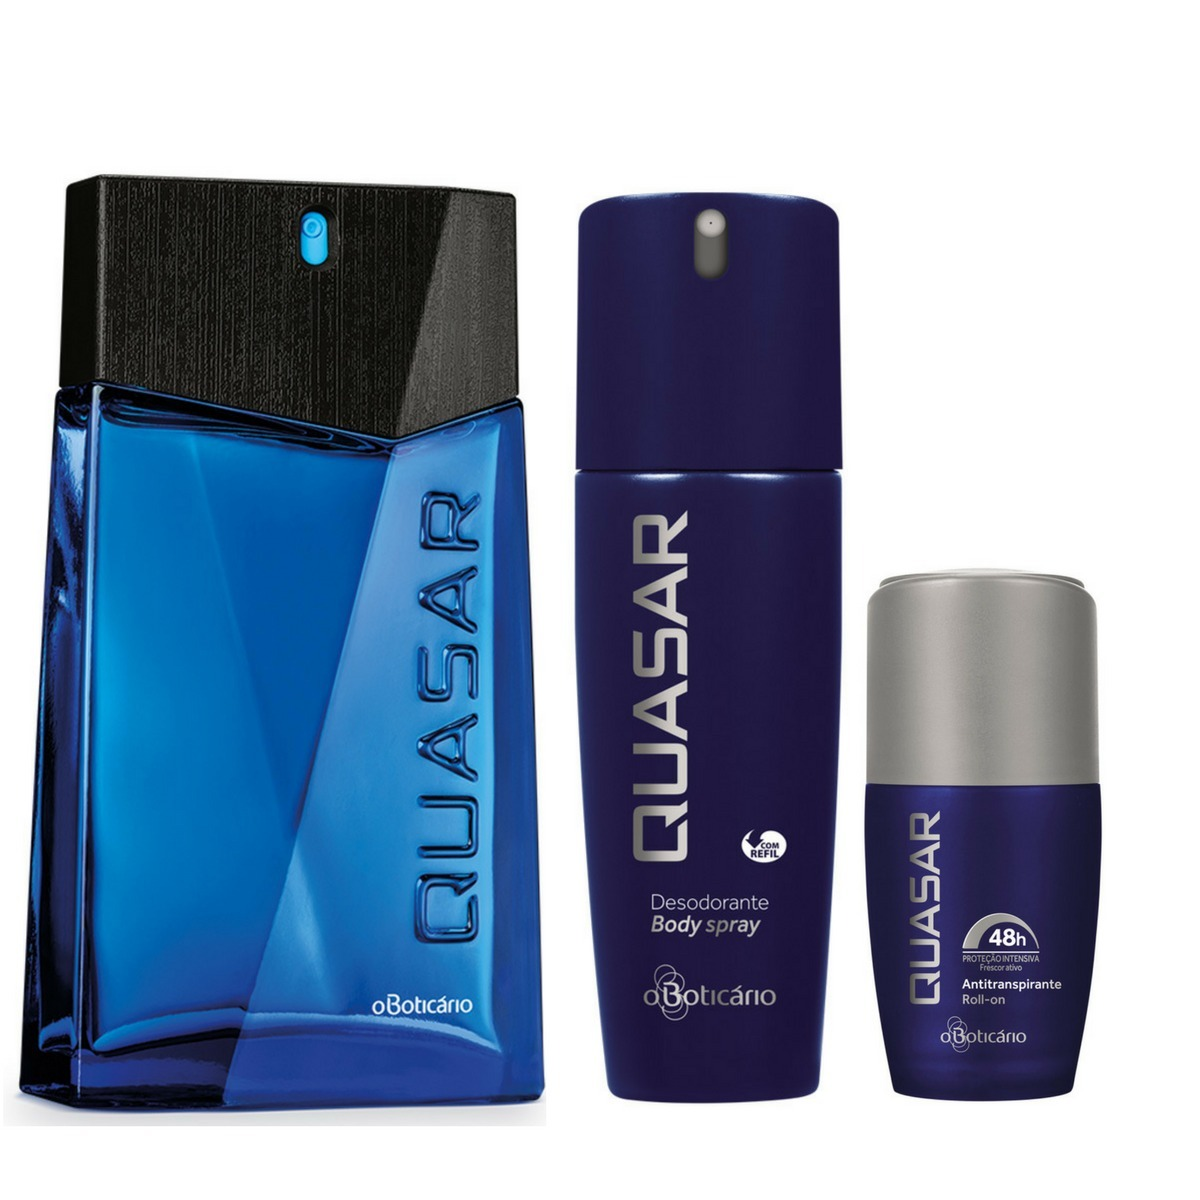 26747b68a kit perfume masculino quasar+des roll-on+des spray boticario. Carregando  zoom.